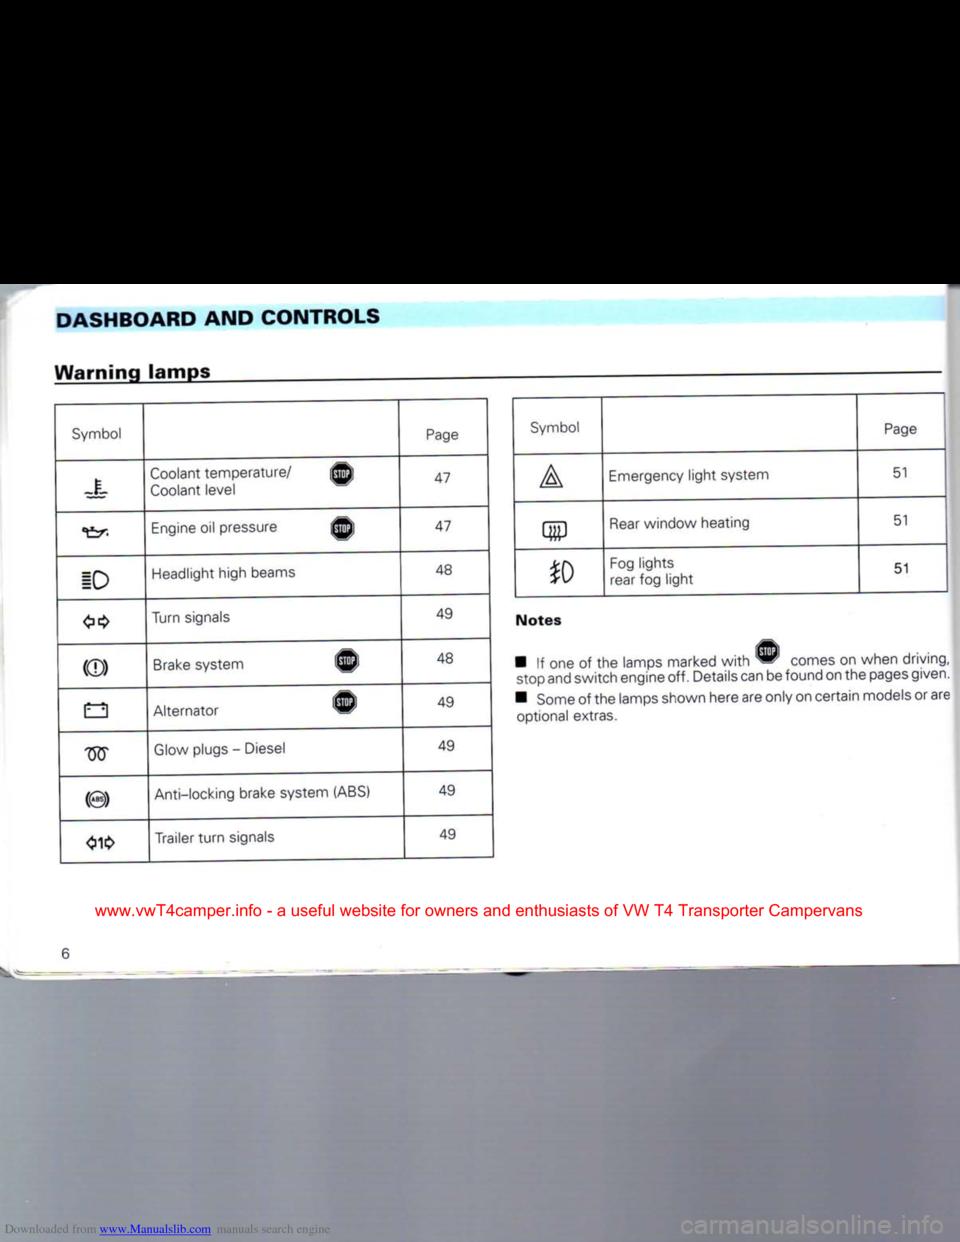 Vw T4 Dashboard Wiring Diagram : Vw t camper wiring diagram transporter